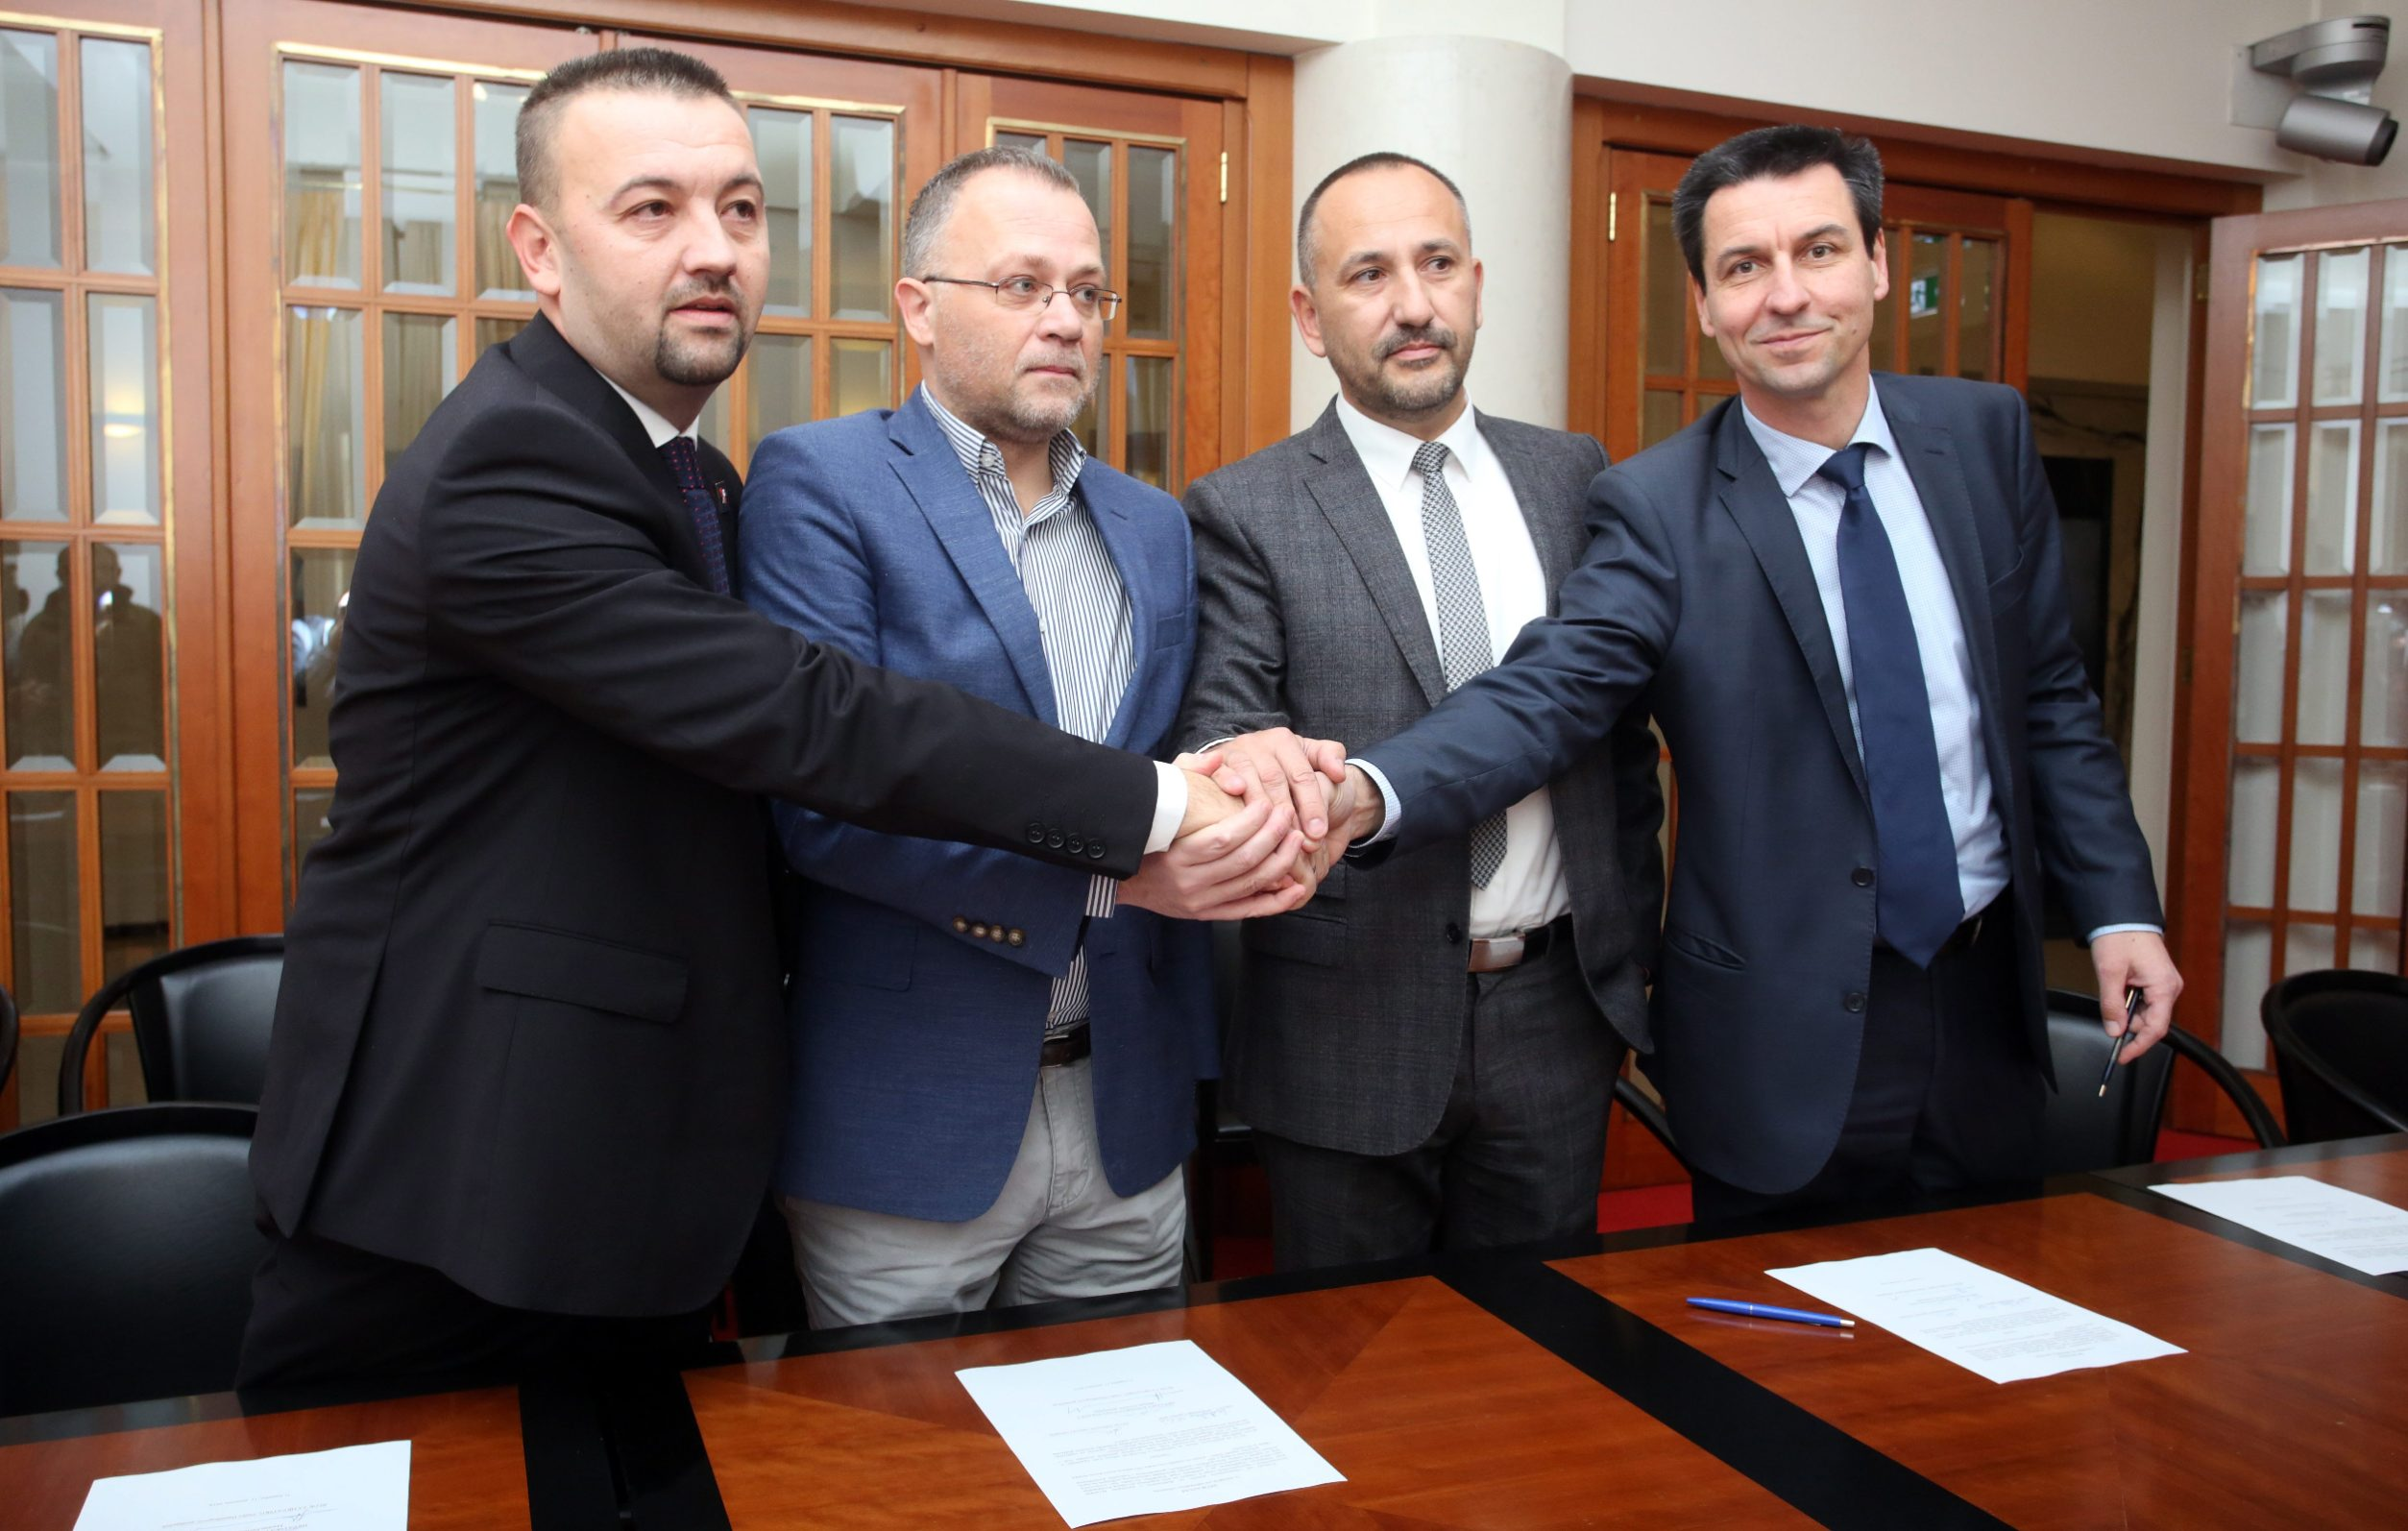 Hrvoje Zekanović, Zlatko Hasanbegović, Marjan Paliček i Ladislav Ilčić